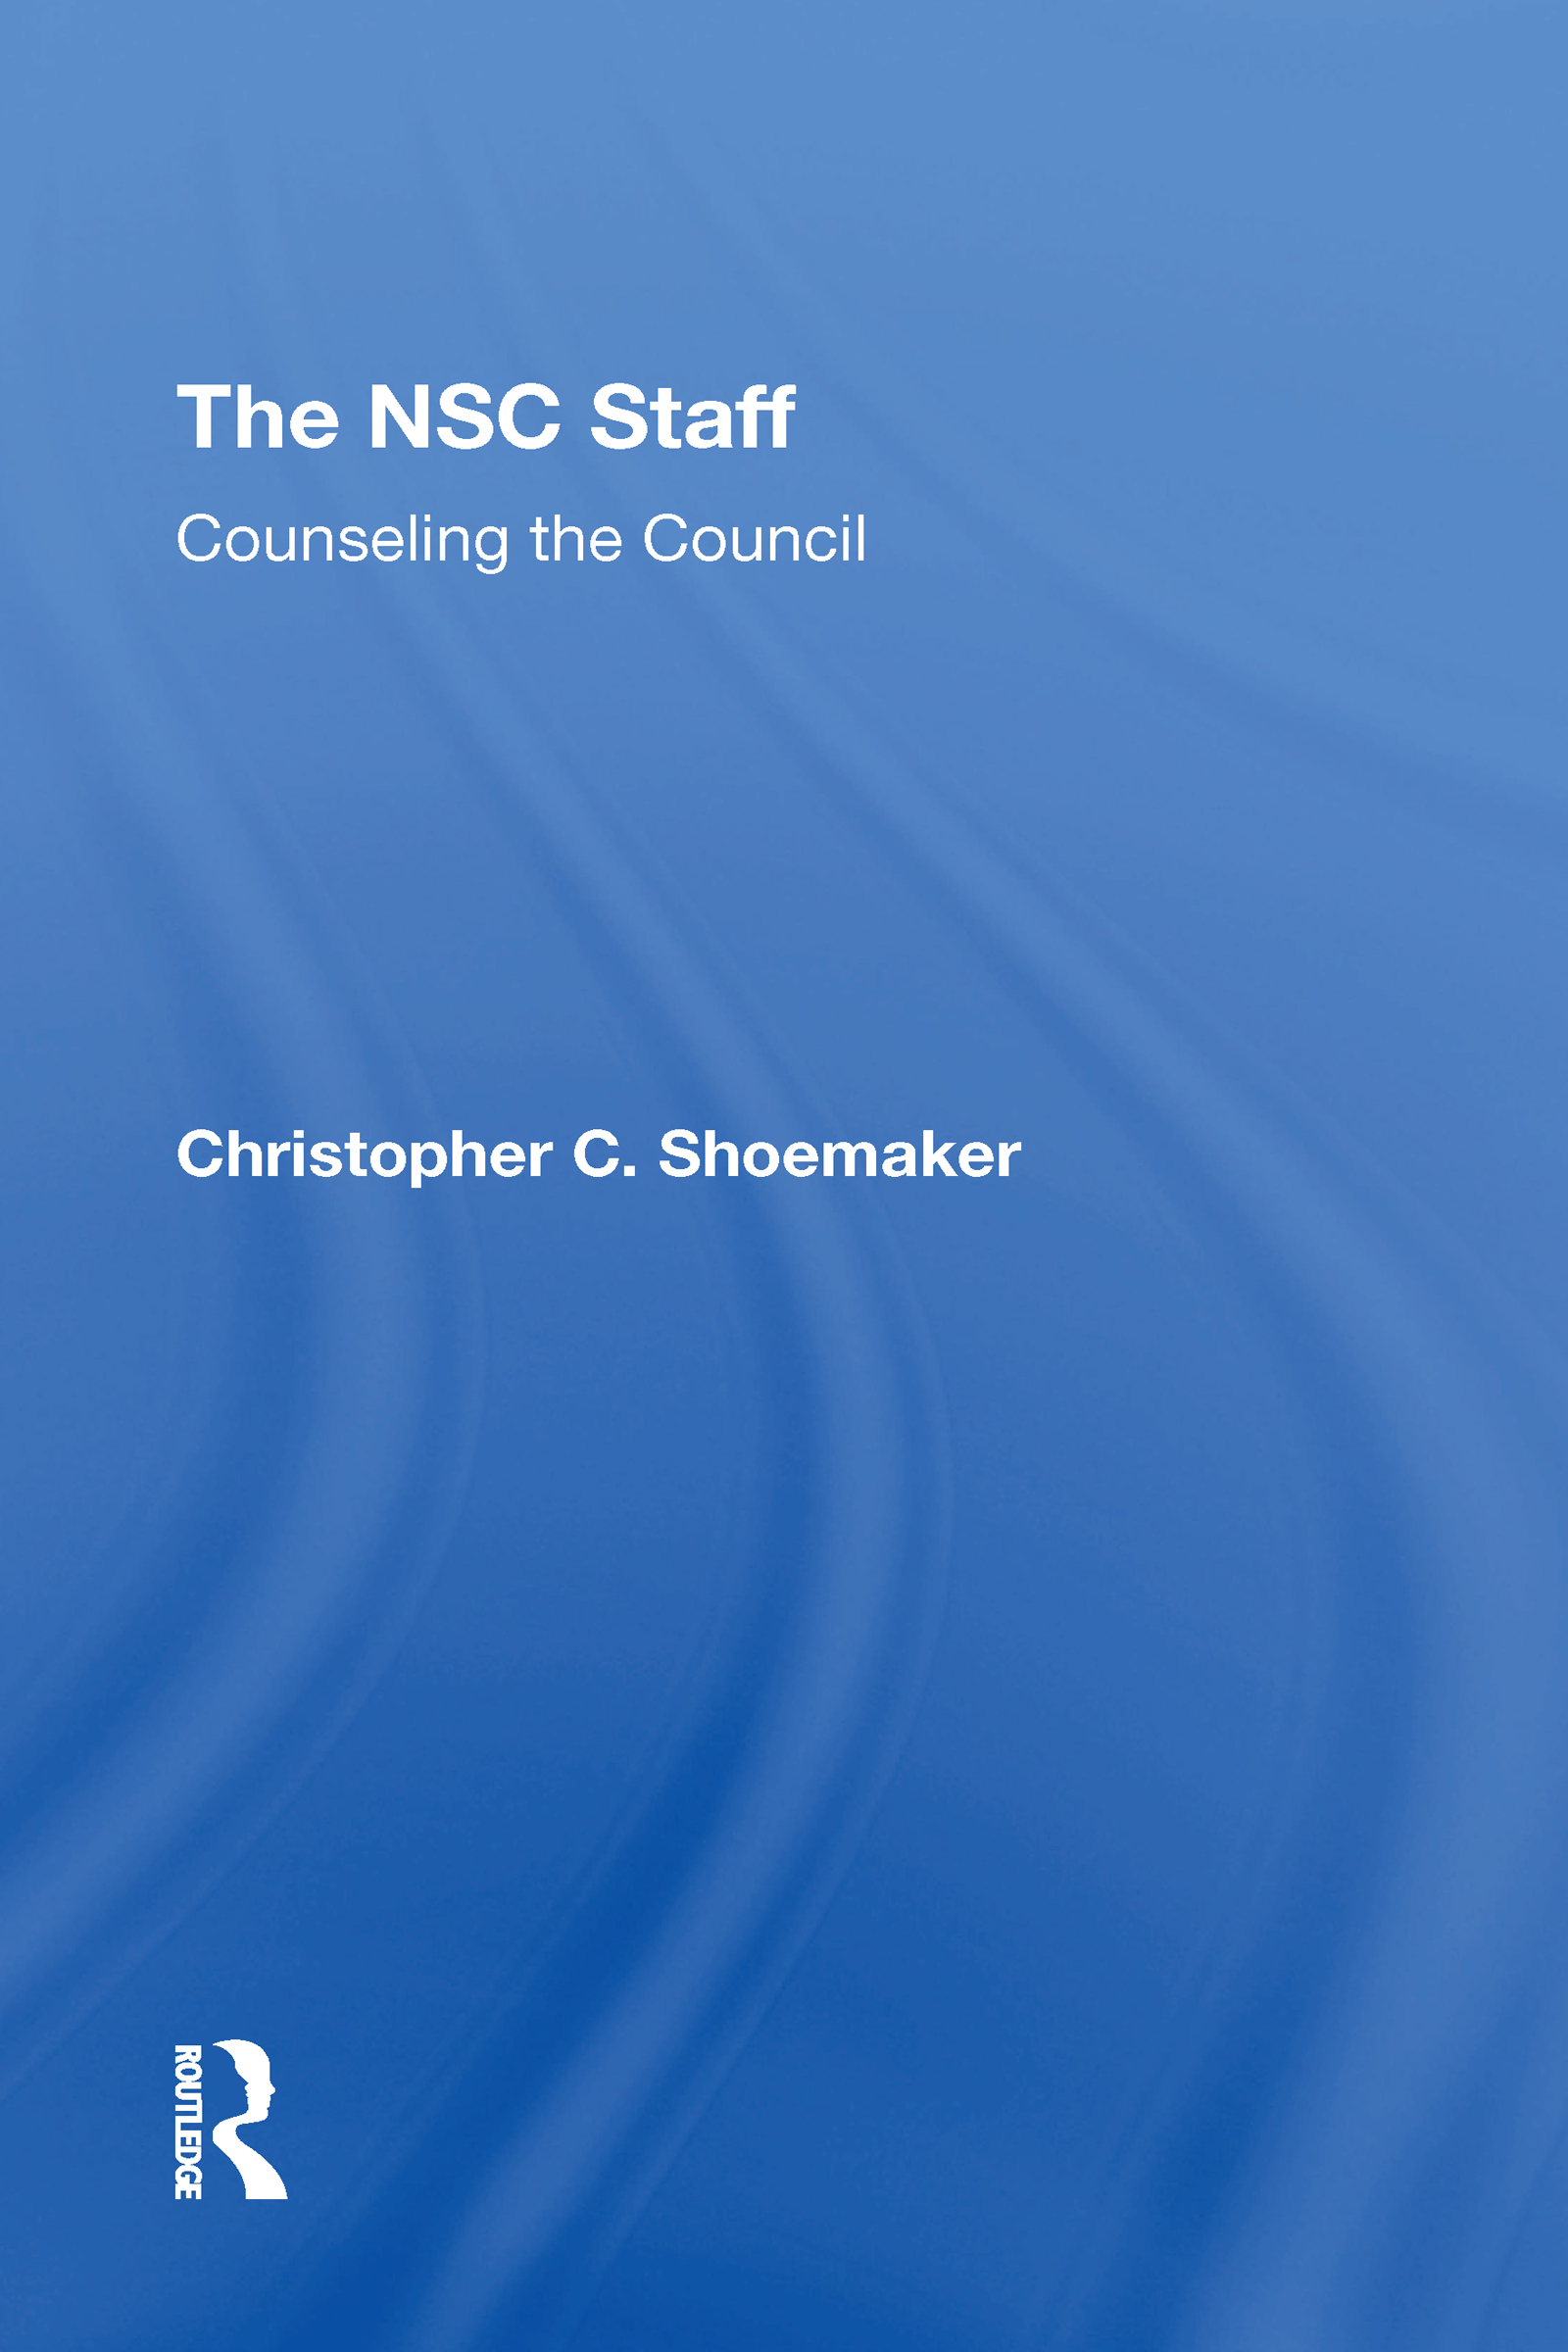 The NSC Staff